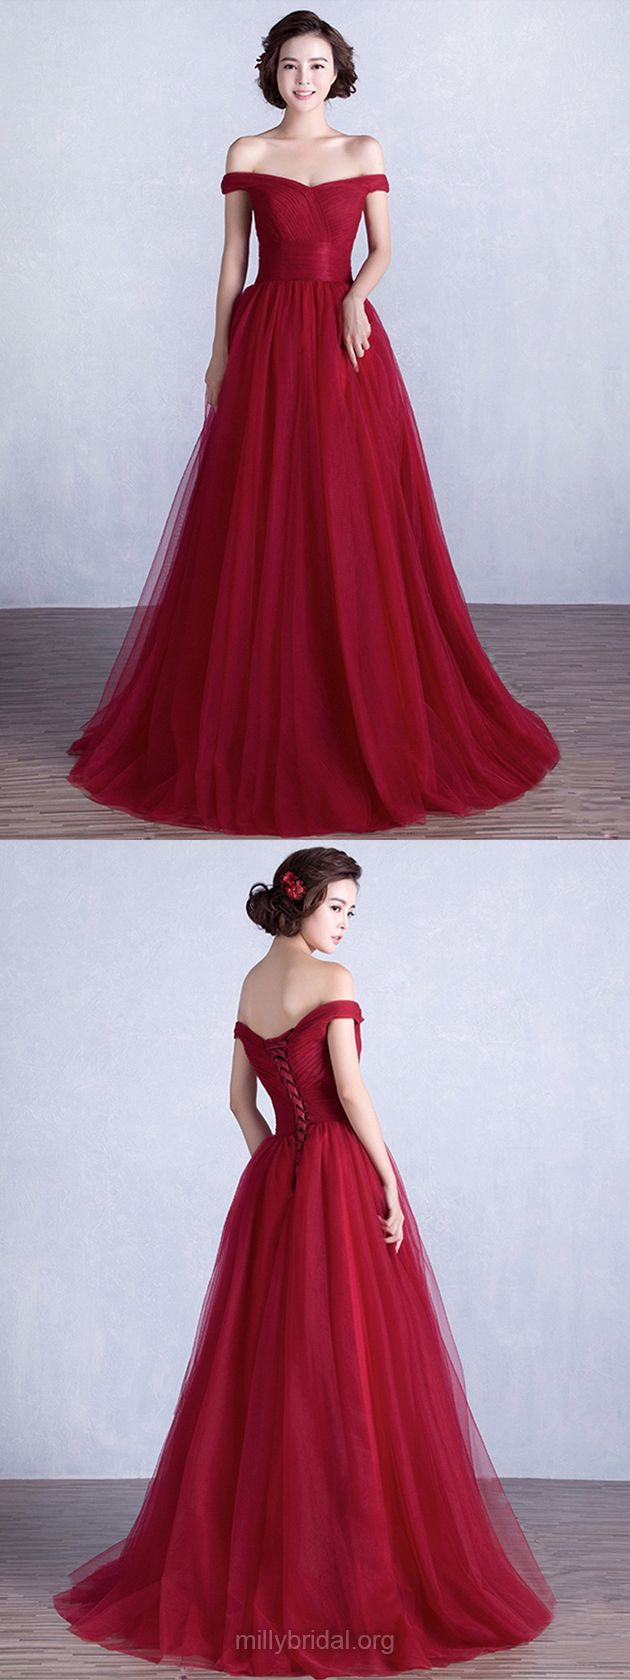 Burgundy Prom Dresses Long, 2018 Prom Dresses Princess, Off-the ...